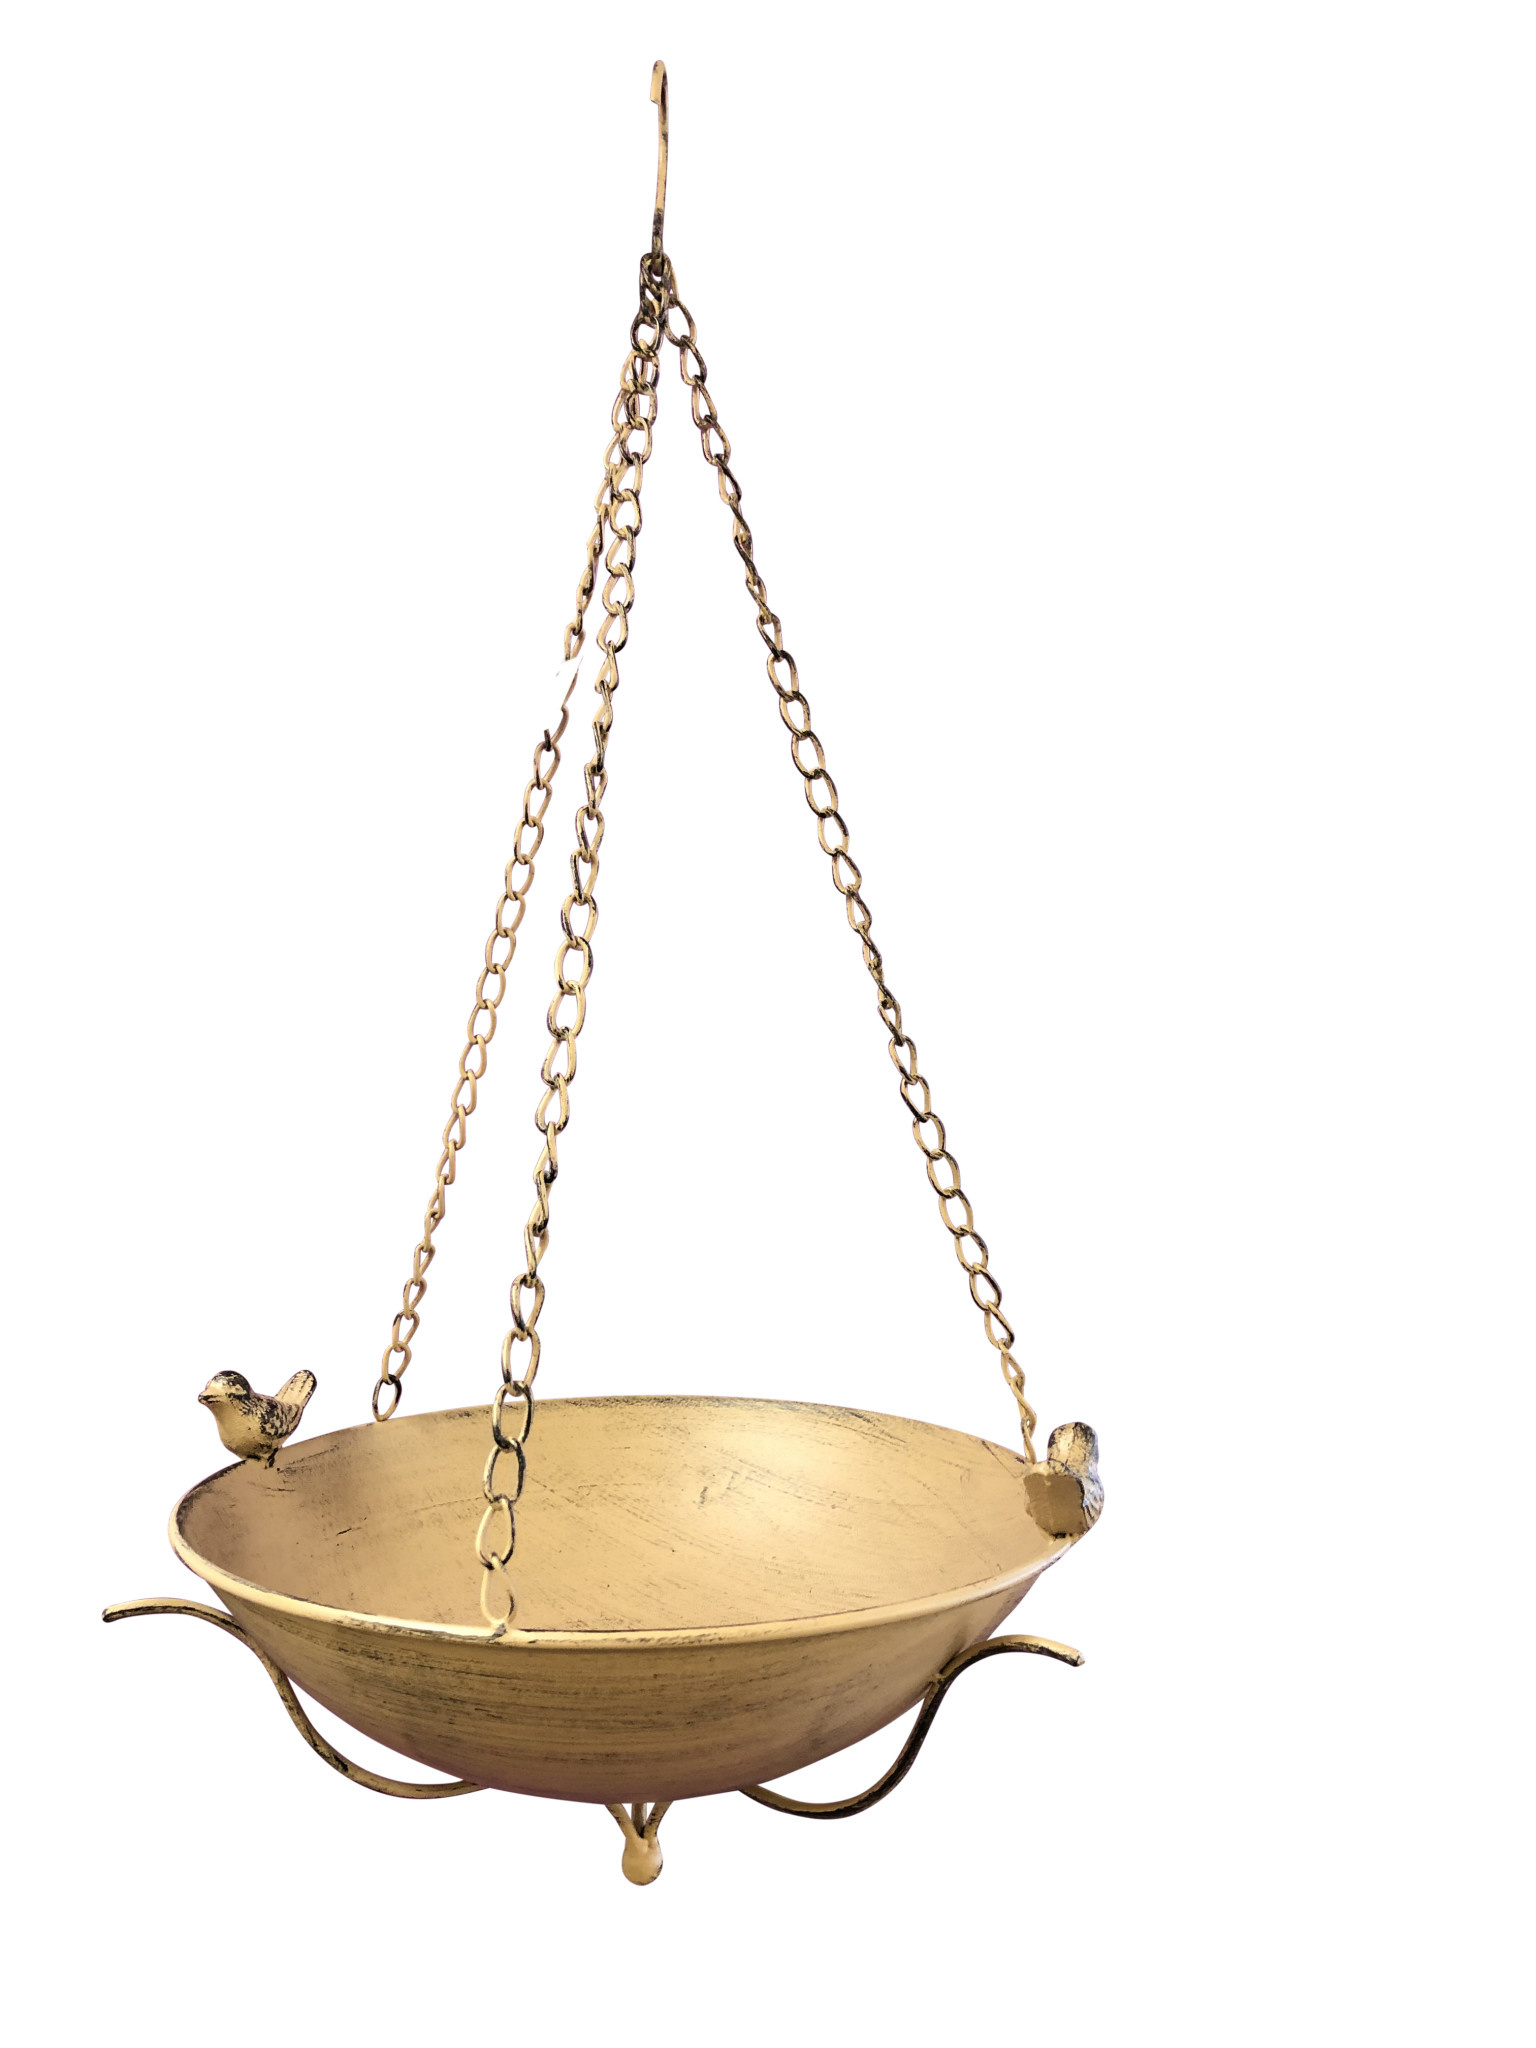 Metal Hanging Bird Bath